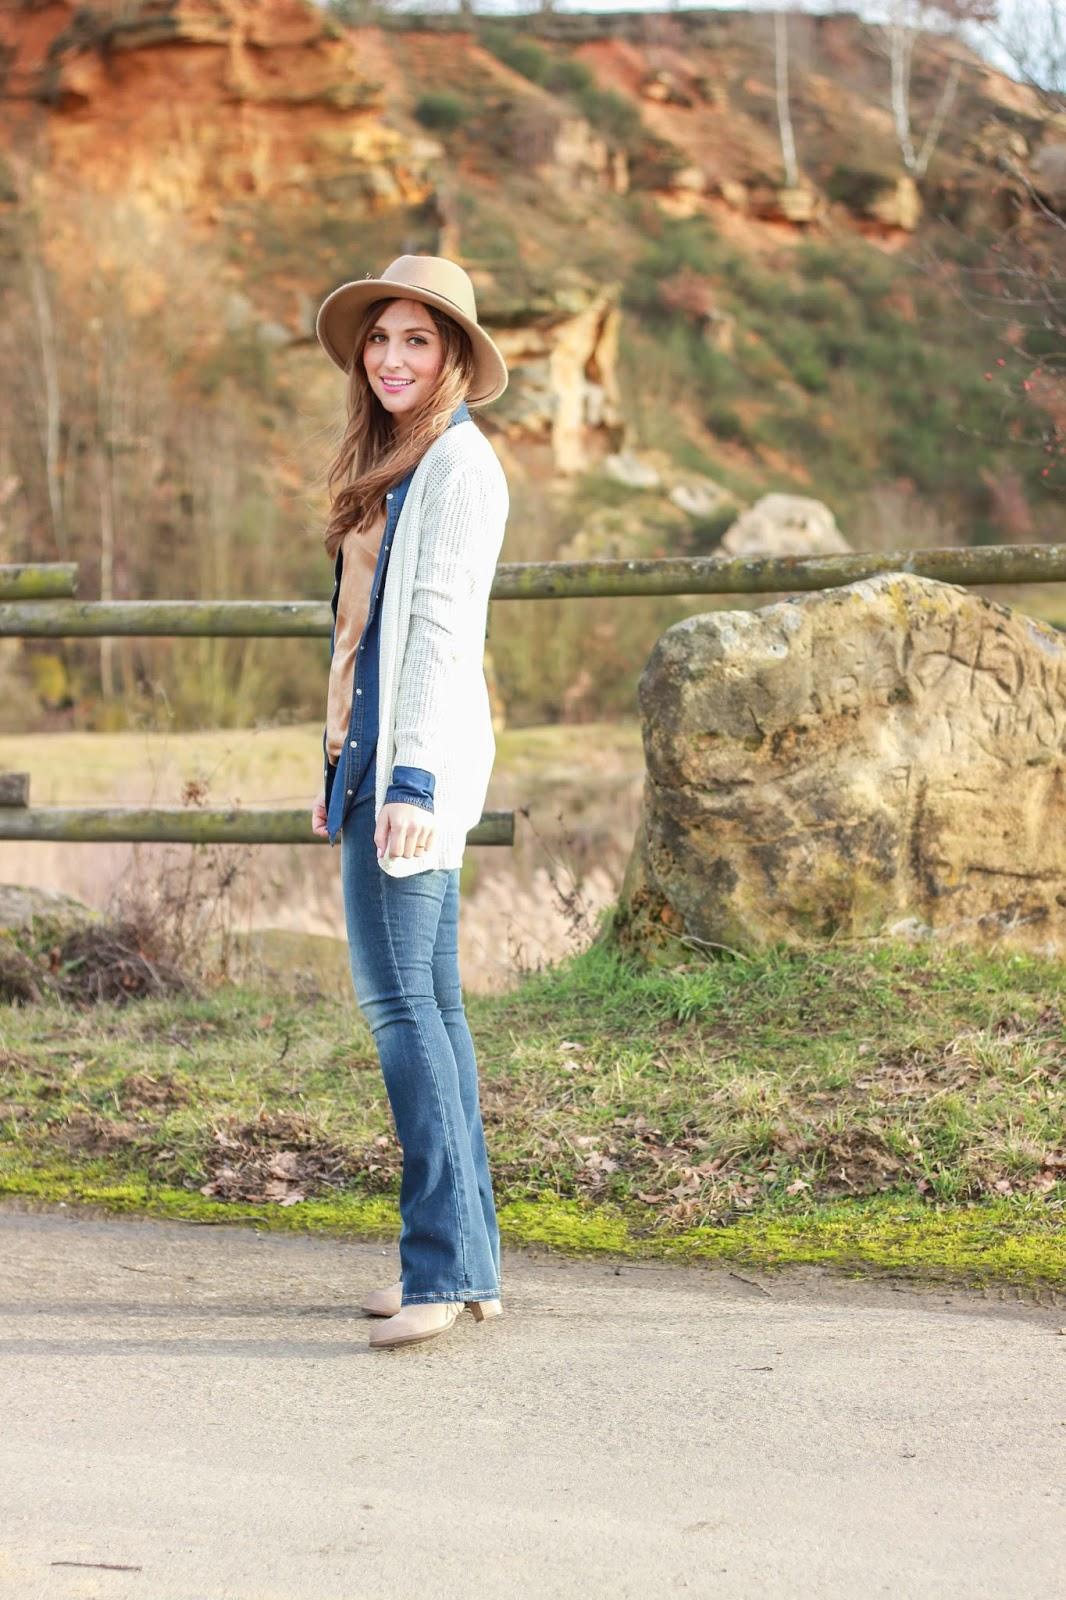 Texas Style- Fashionblogger aus Deutschland - deutsche Fashionblogger - fashionblogger - German Fashionblogger - Frankfurter Blogger - Fashionblogger aus Frankfurt - Fashionstylebyjohanna - Jeans Outfit -  Modeblogger - Modeblogger aus Deutschland